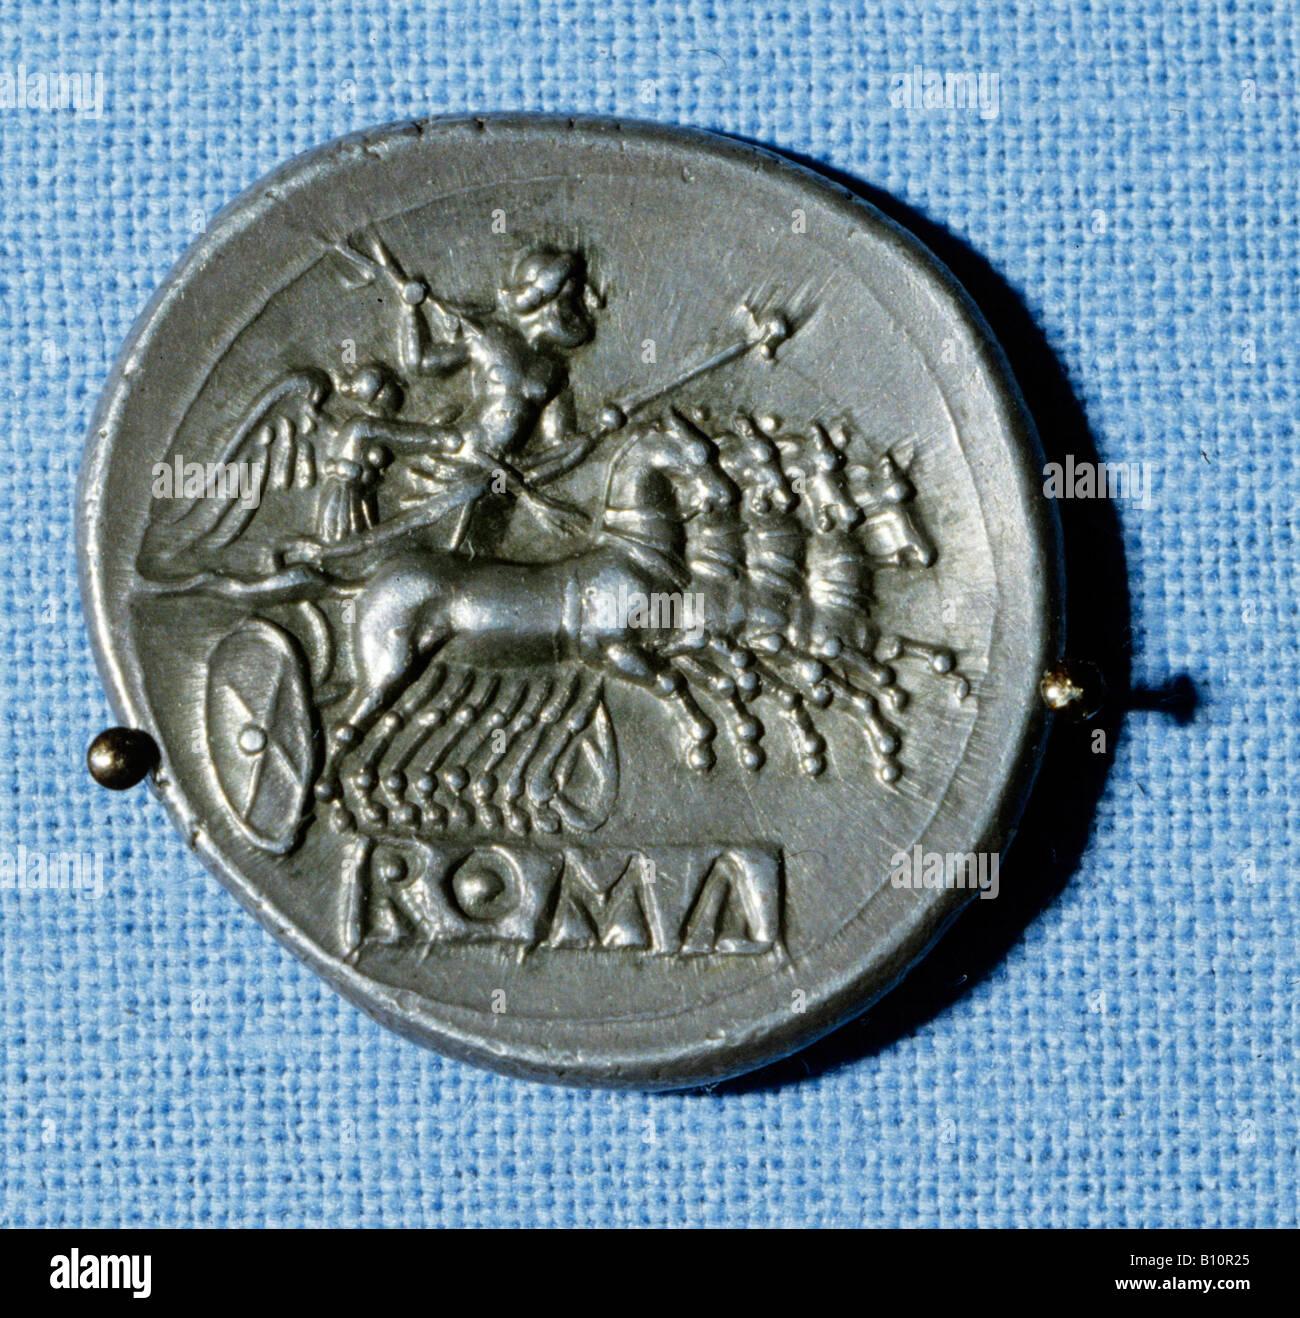 Roman coin Roman Republic period 218 212 BC Copyright AAAC Ltd - Stock Image